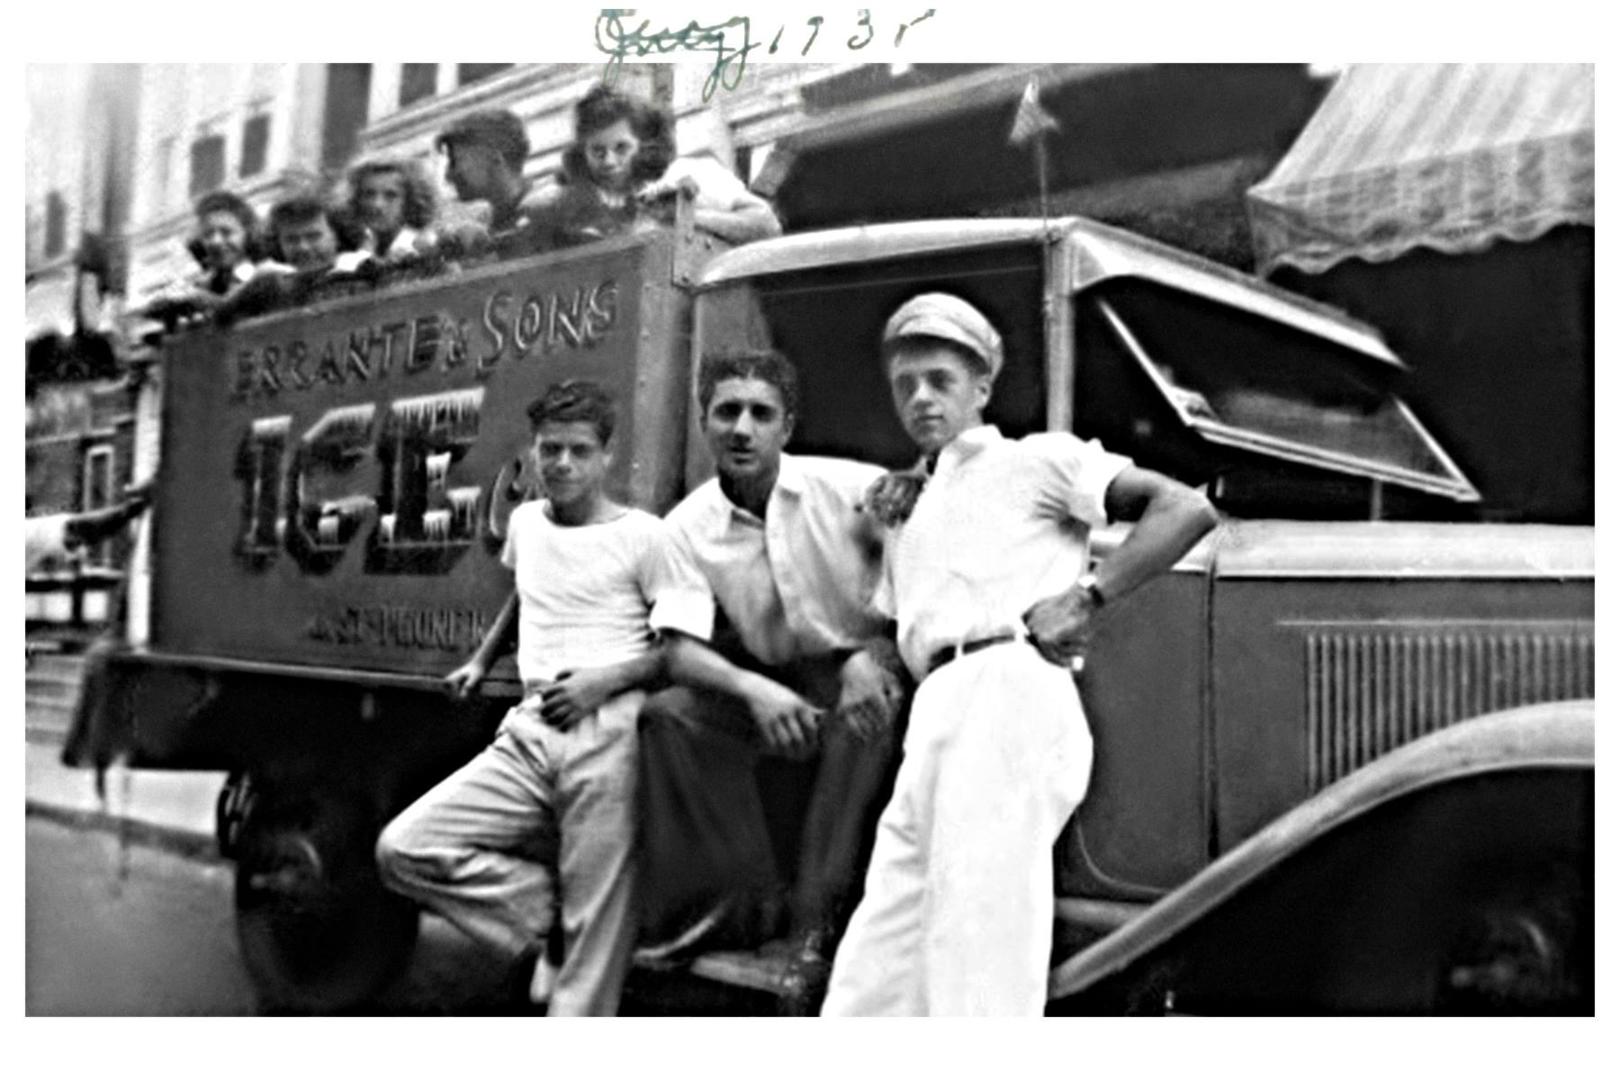 Ferrante & Sons image 4